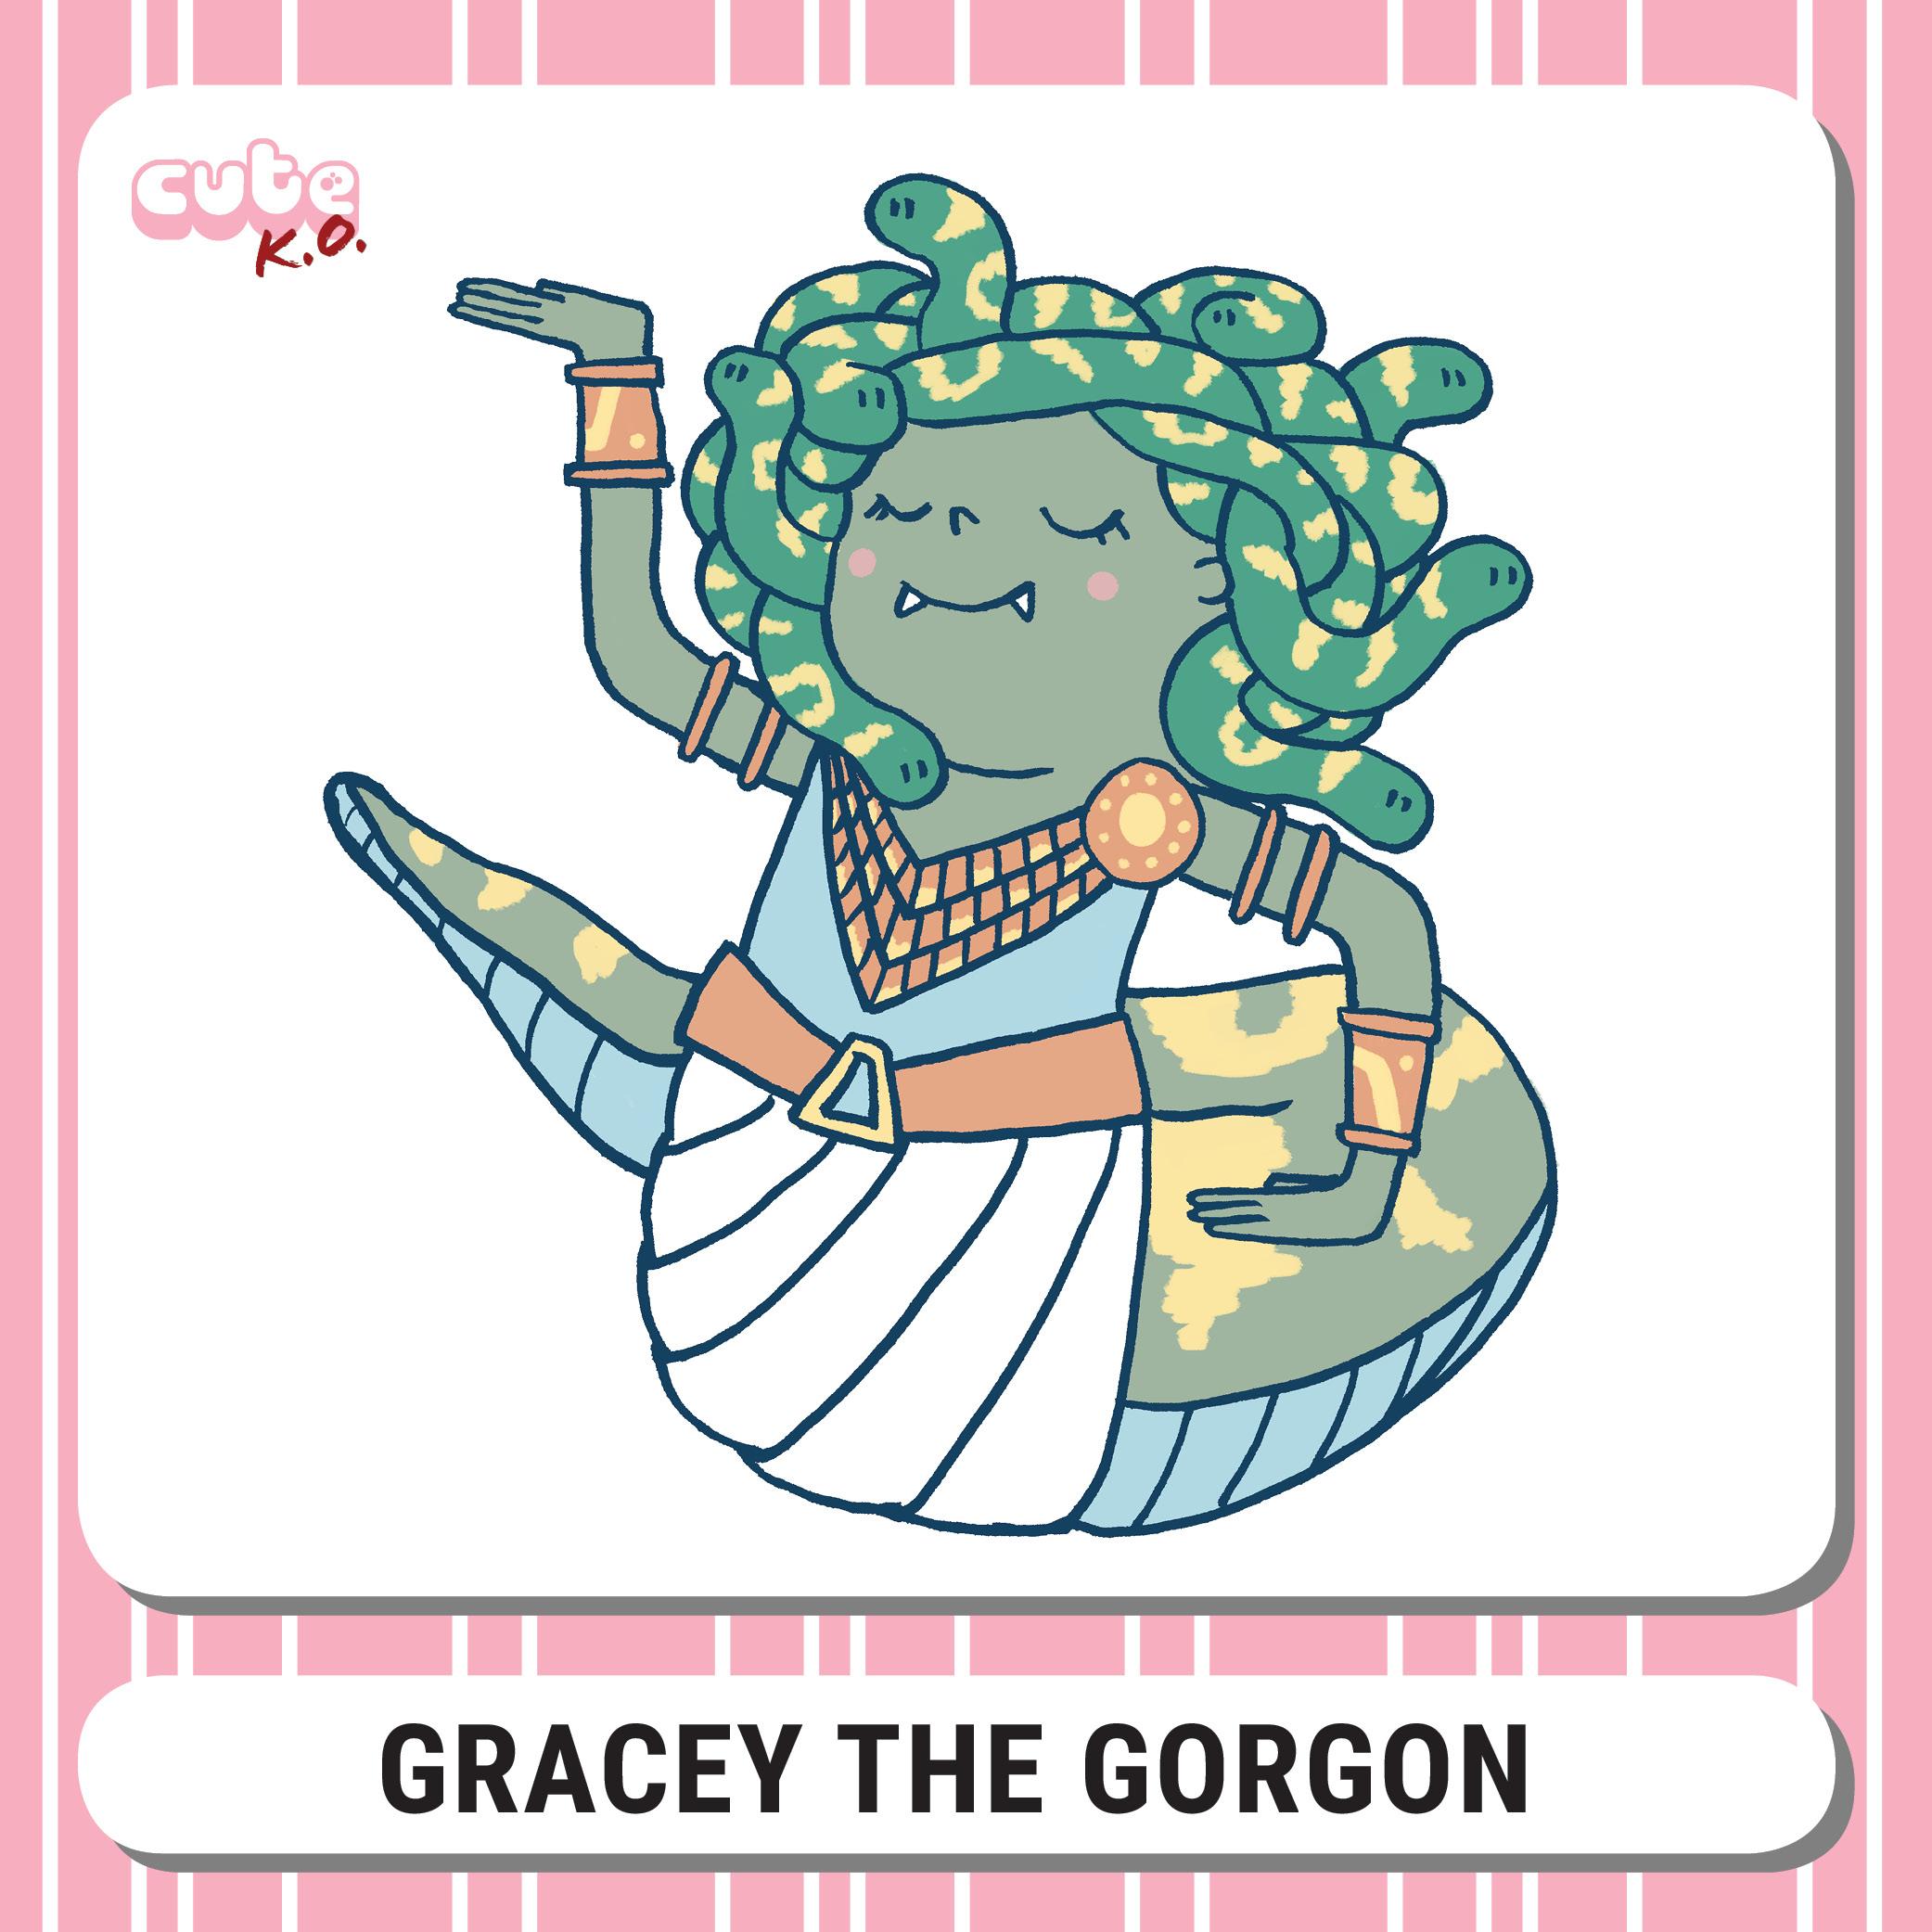 Cute K.O. 2019 Round Four: Gracey the Gorgon